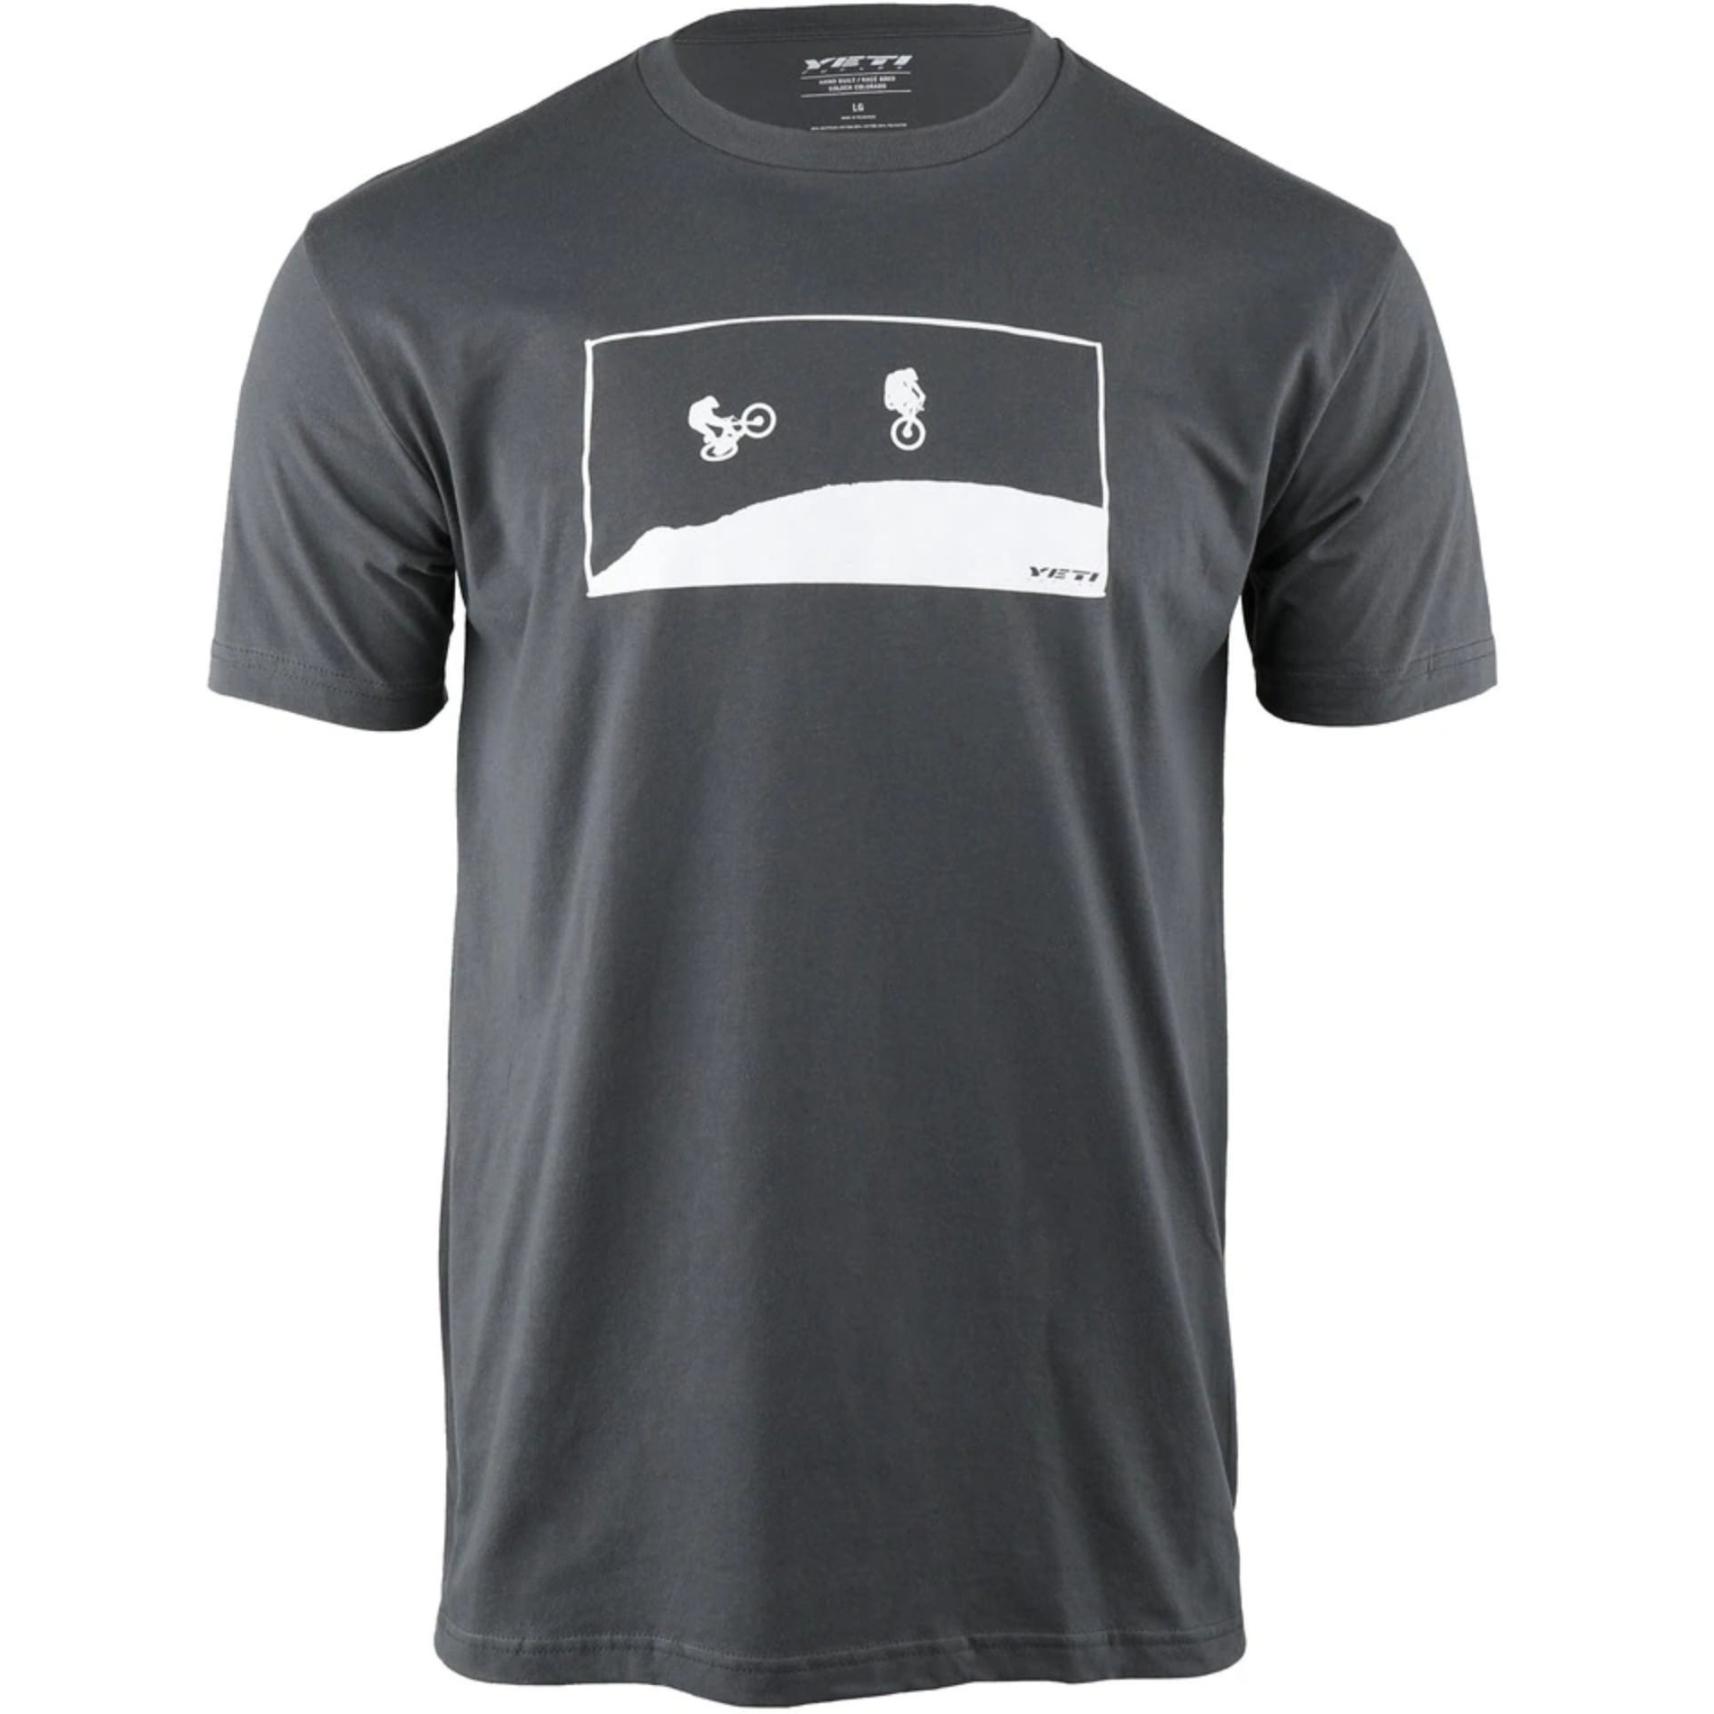 Bild von Yeti Cycles Float T-Shirt - Metal